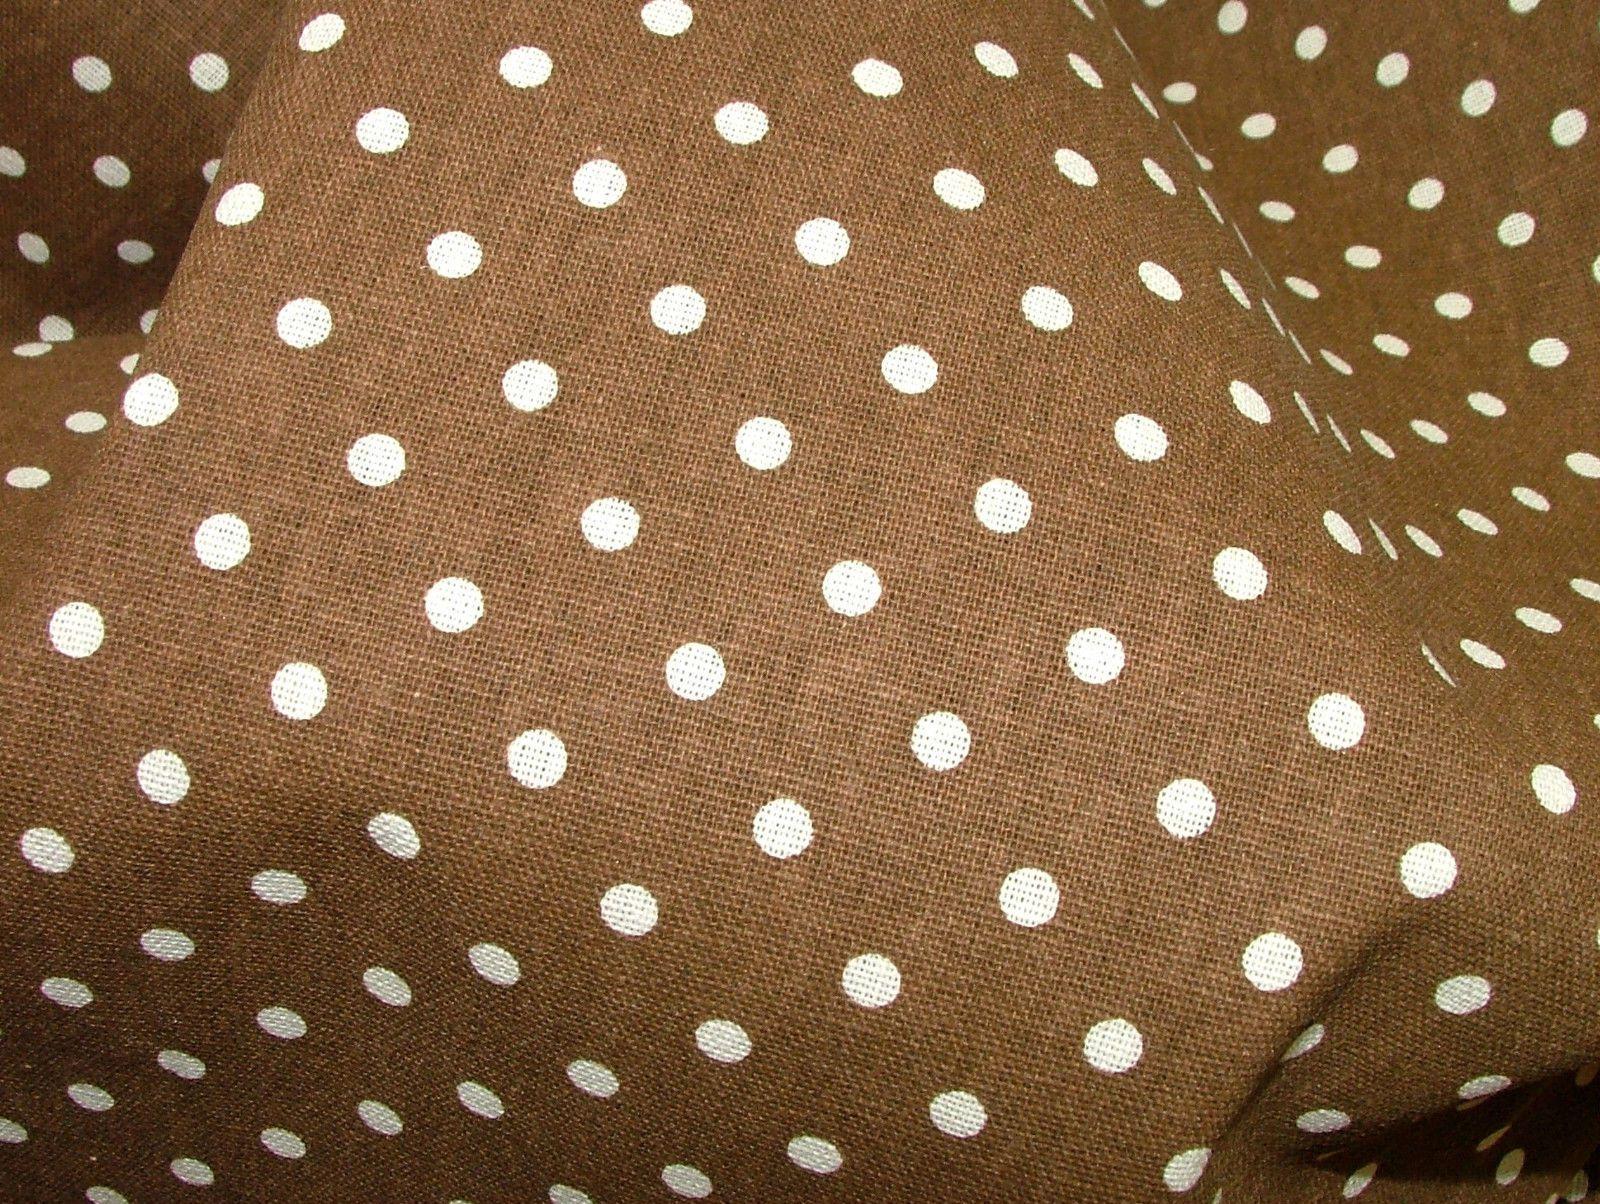 Brown Polka Dot Cotton Linen Curtain Soft Furnishing Craft